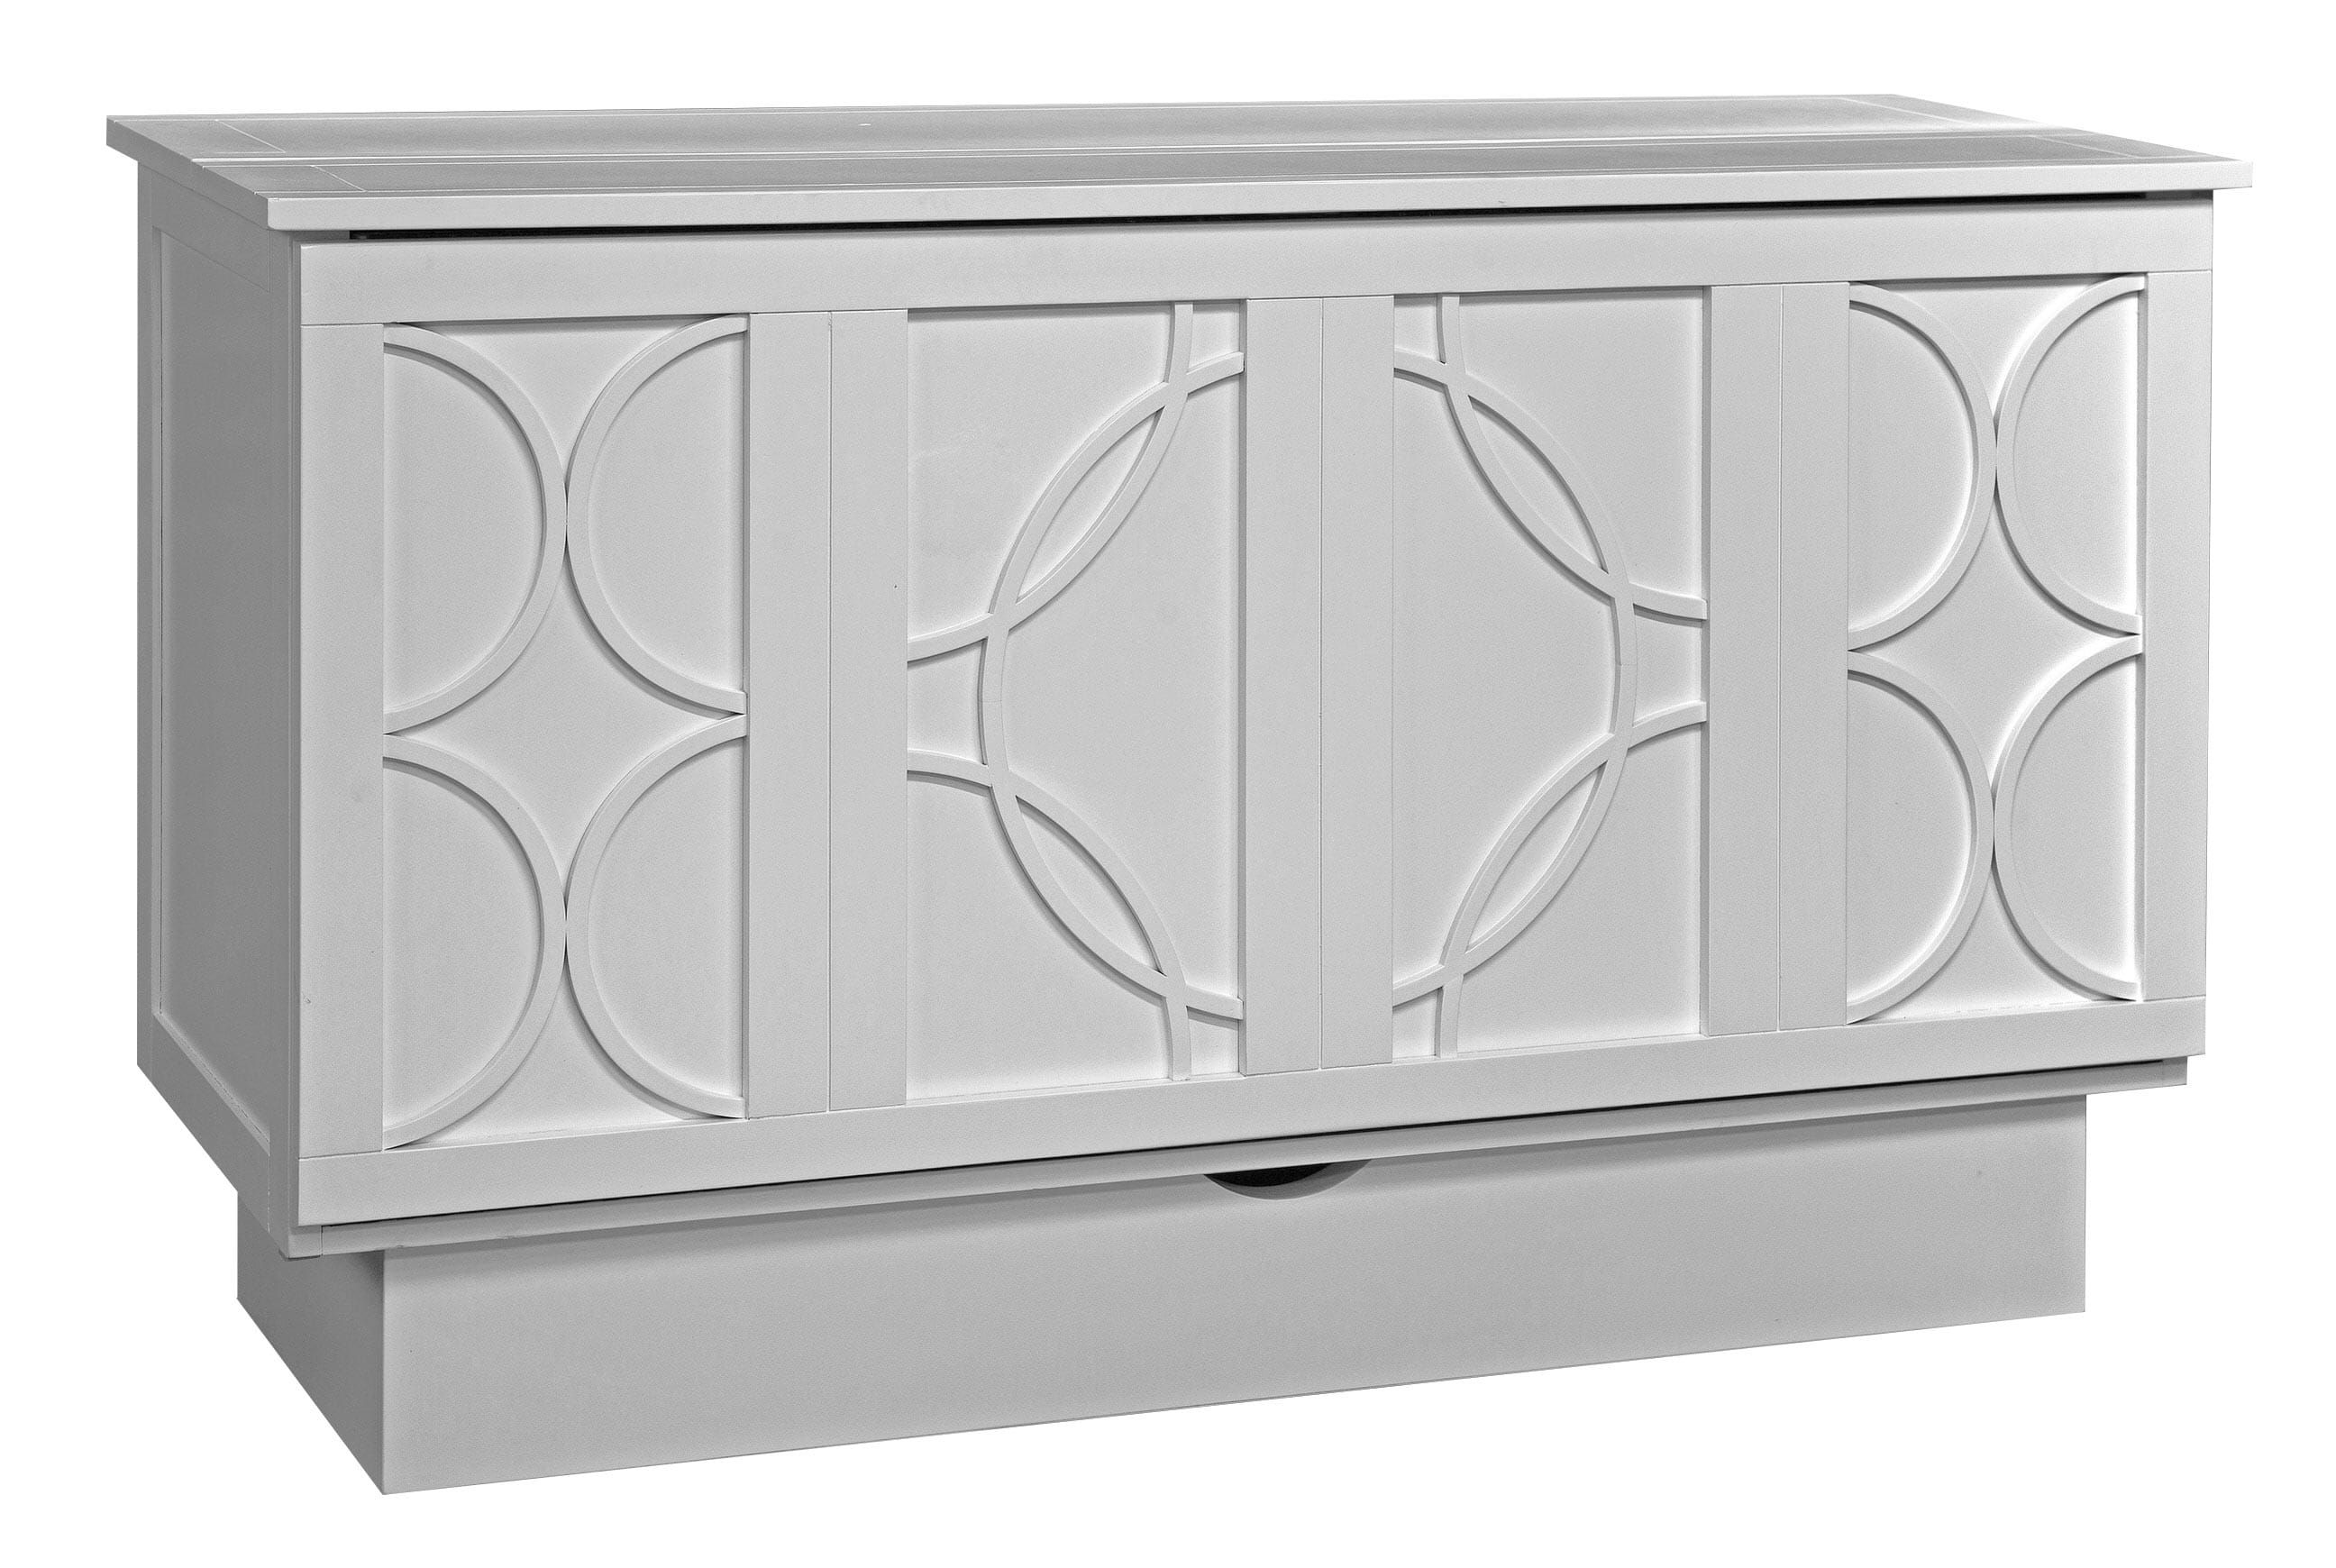 Brussels Queen Murphy Bed White by Arason